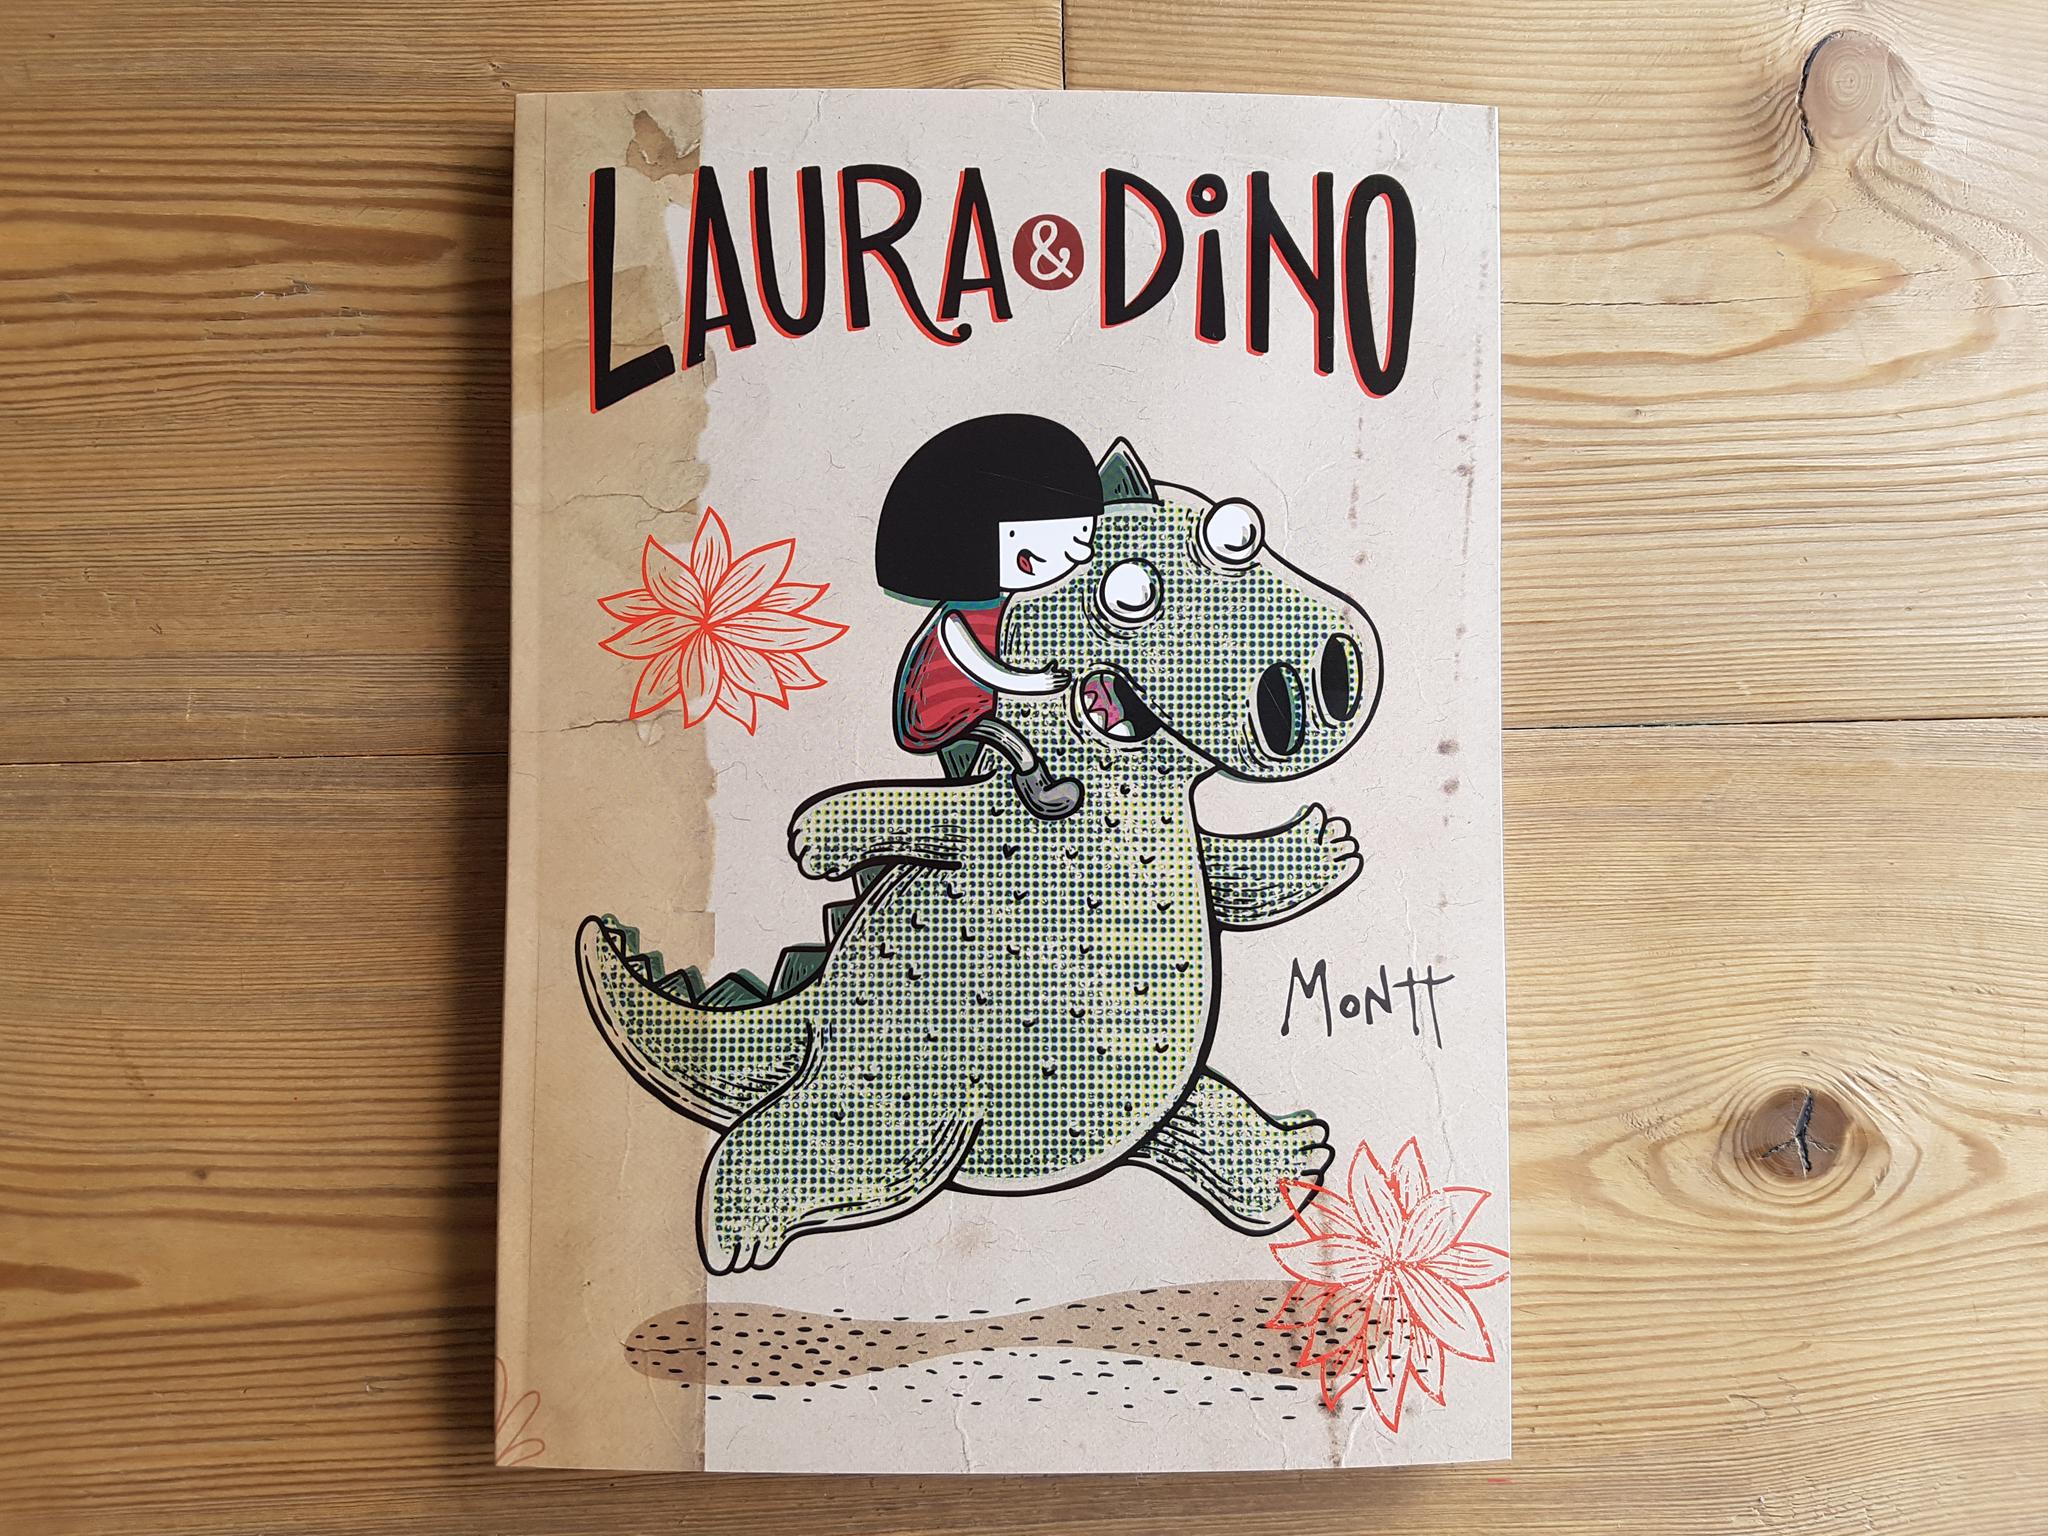 Laura & Dino, un libro de Alberto Montt